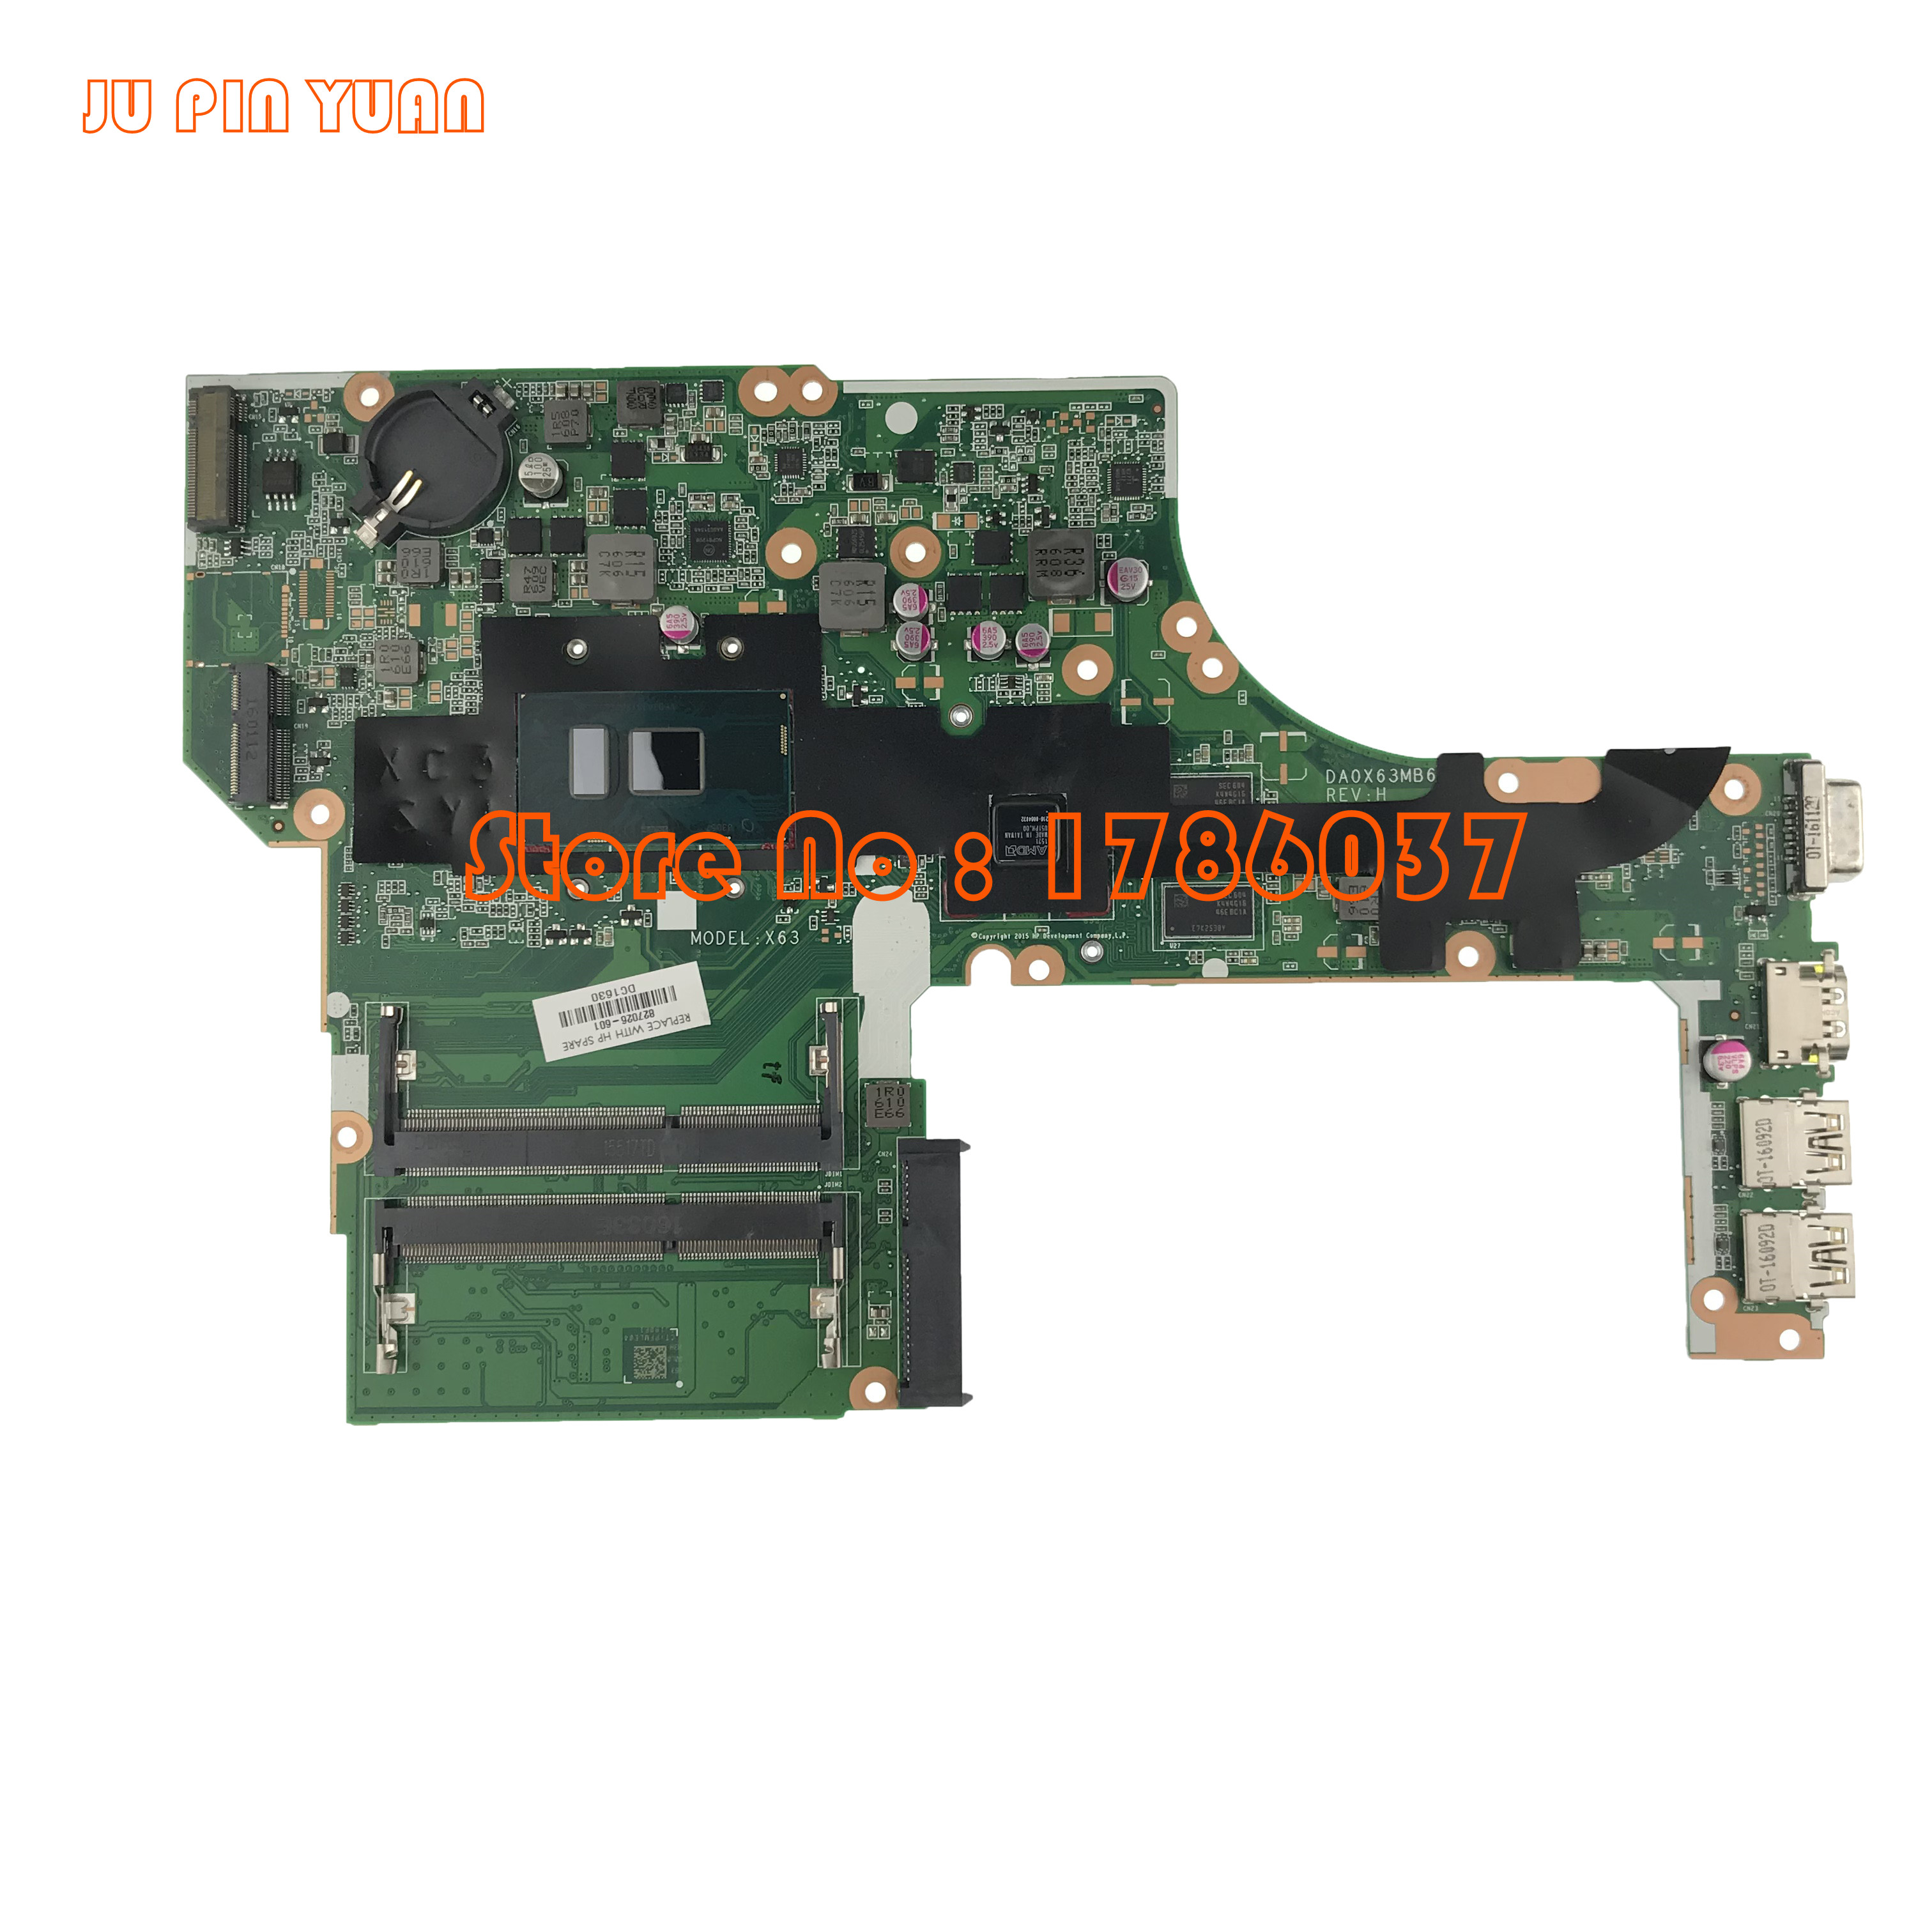 JU PIN YUAN 827026-001 827026-501 827026-601 para HP 450 G3 470 G3 series laptop motherboard X63 DA0X63MB6H1 totalmente Testado